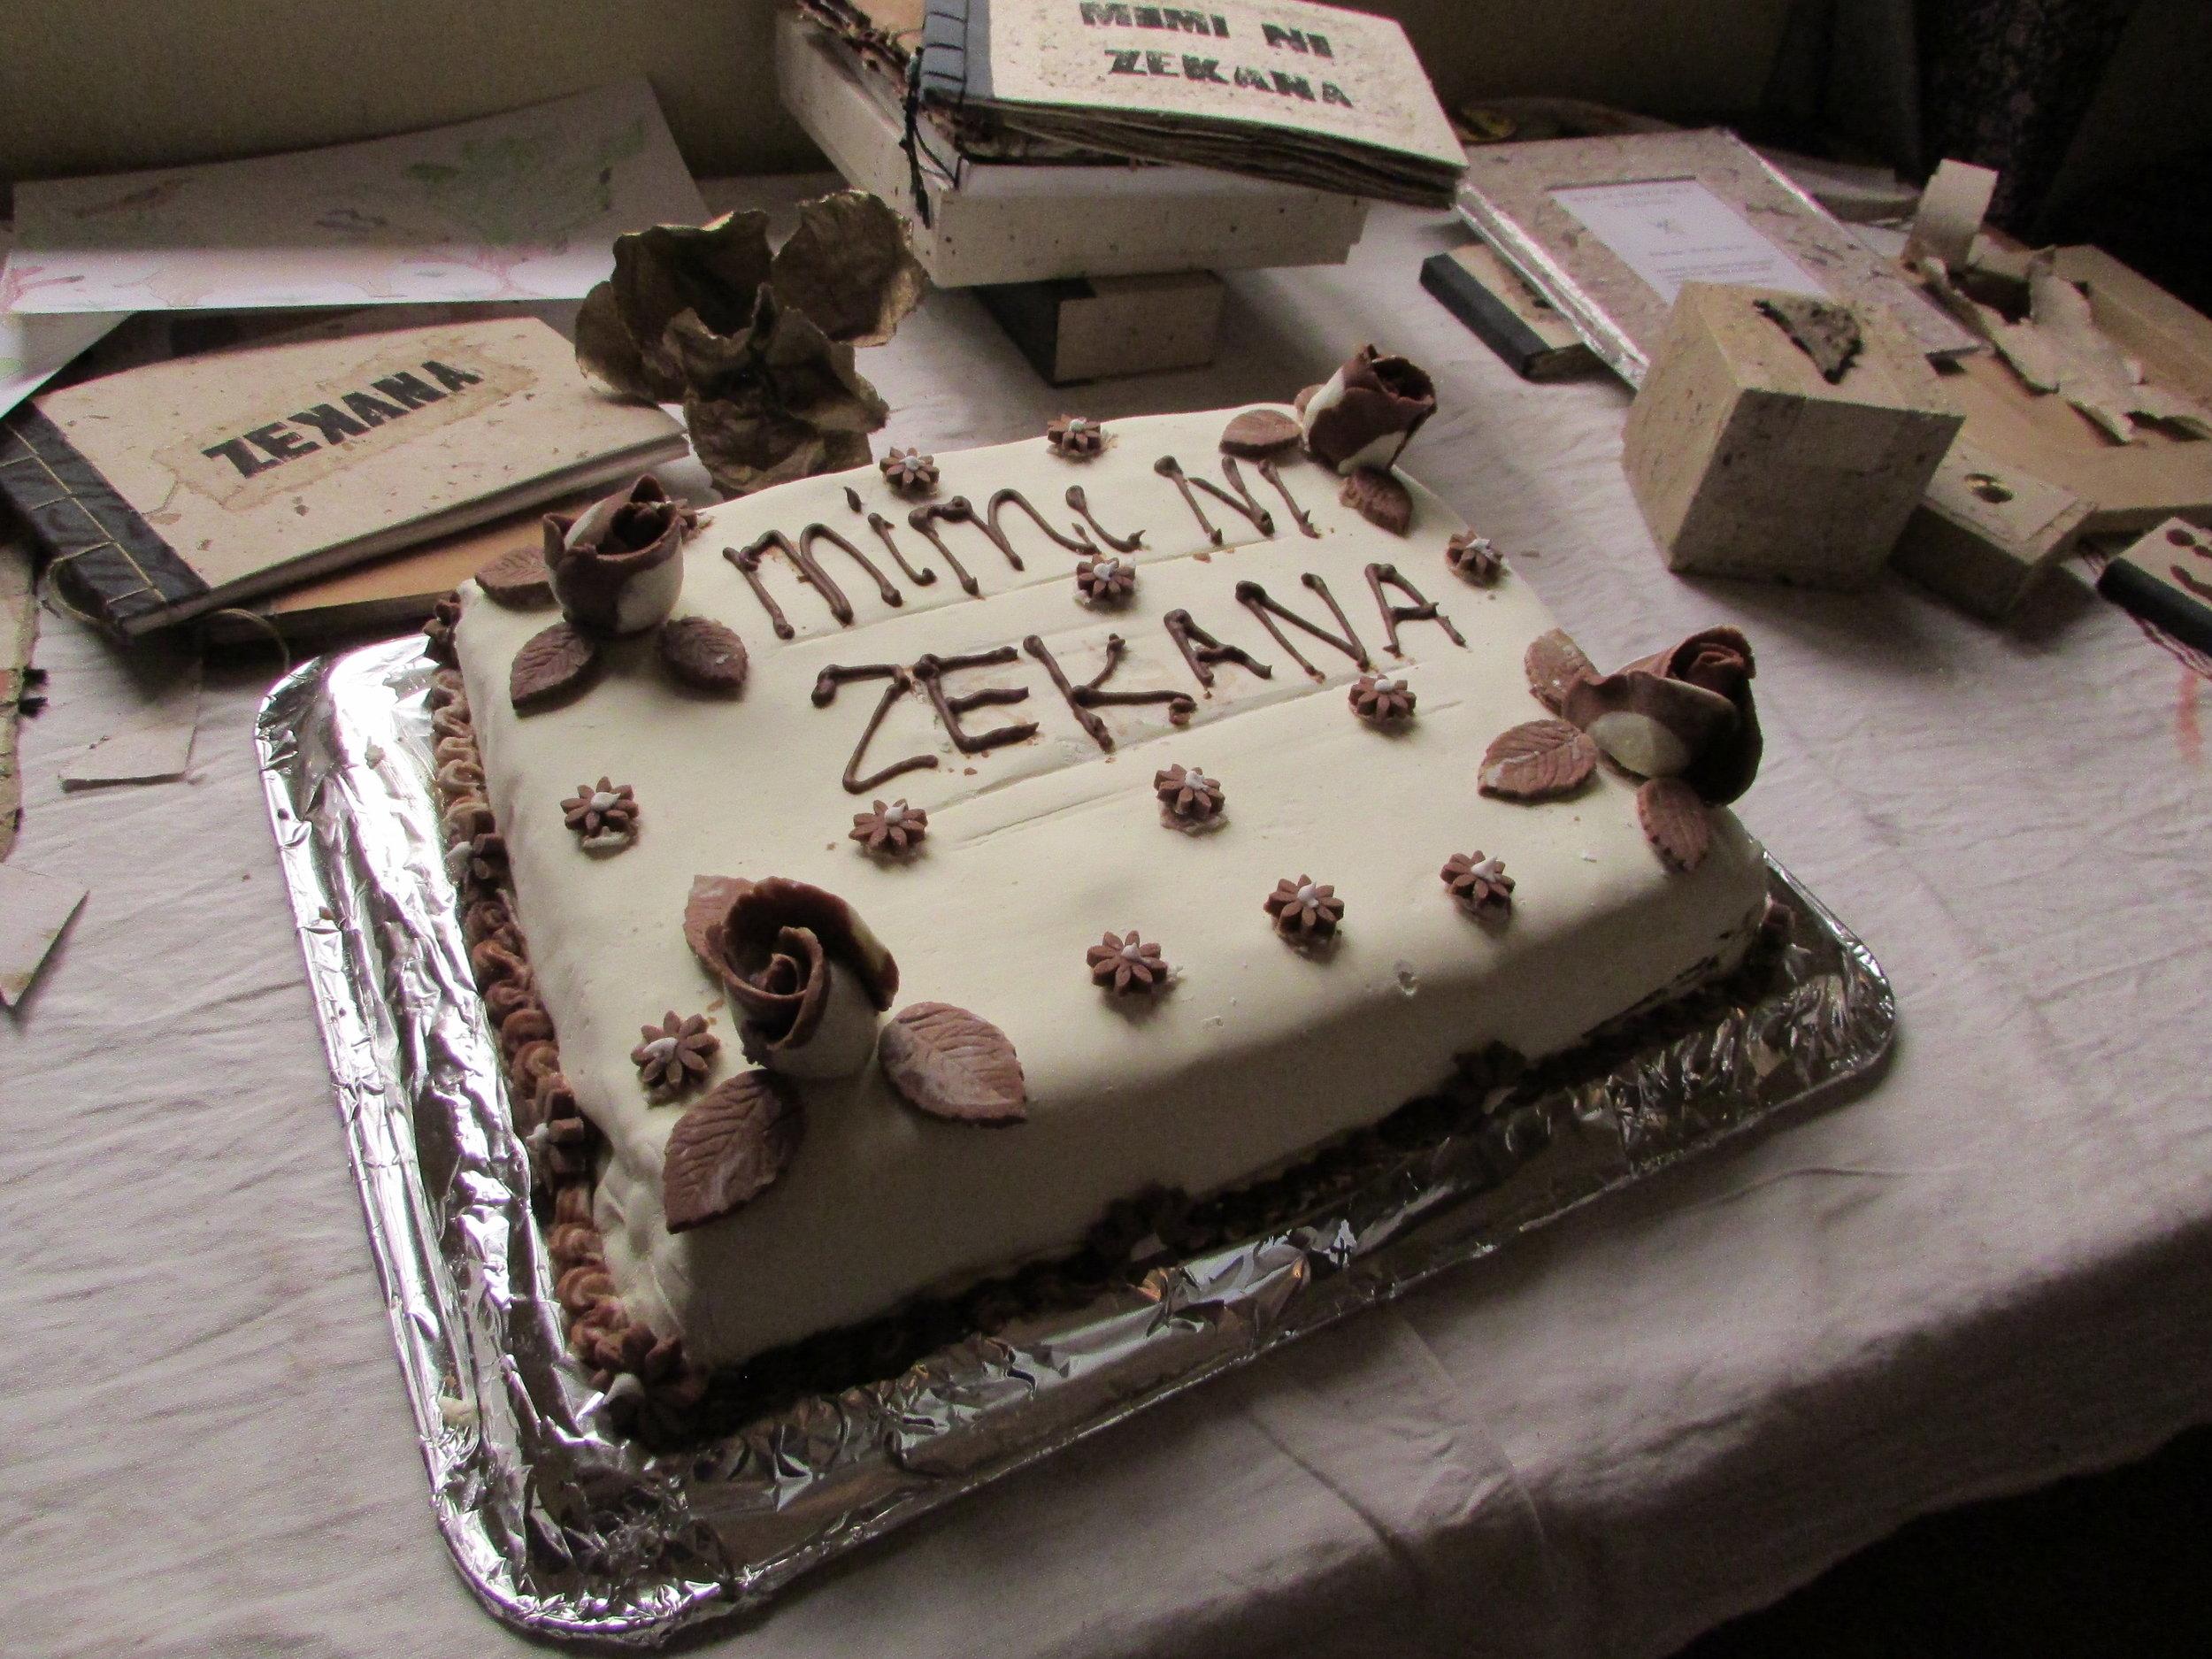 Everyone gets cake!